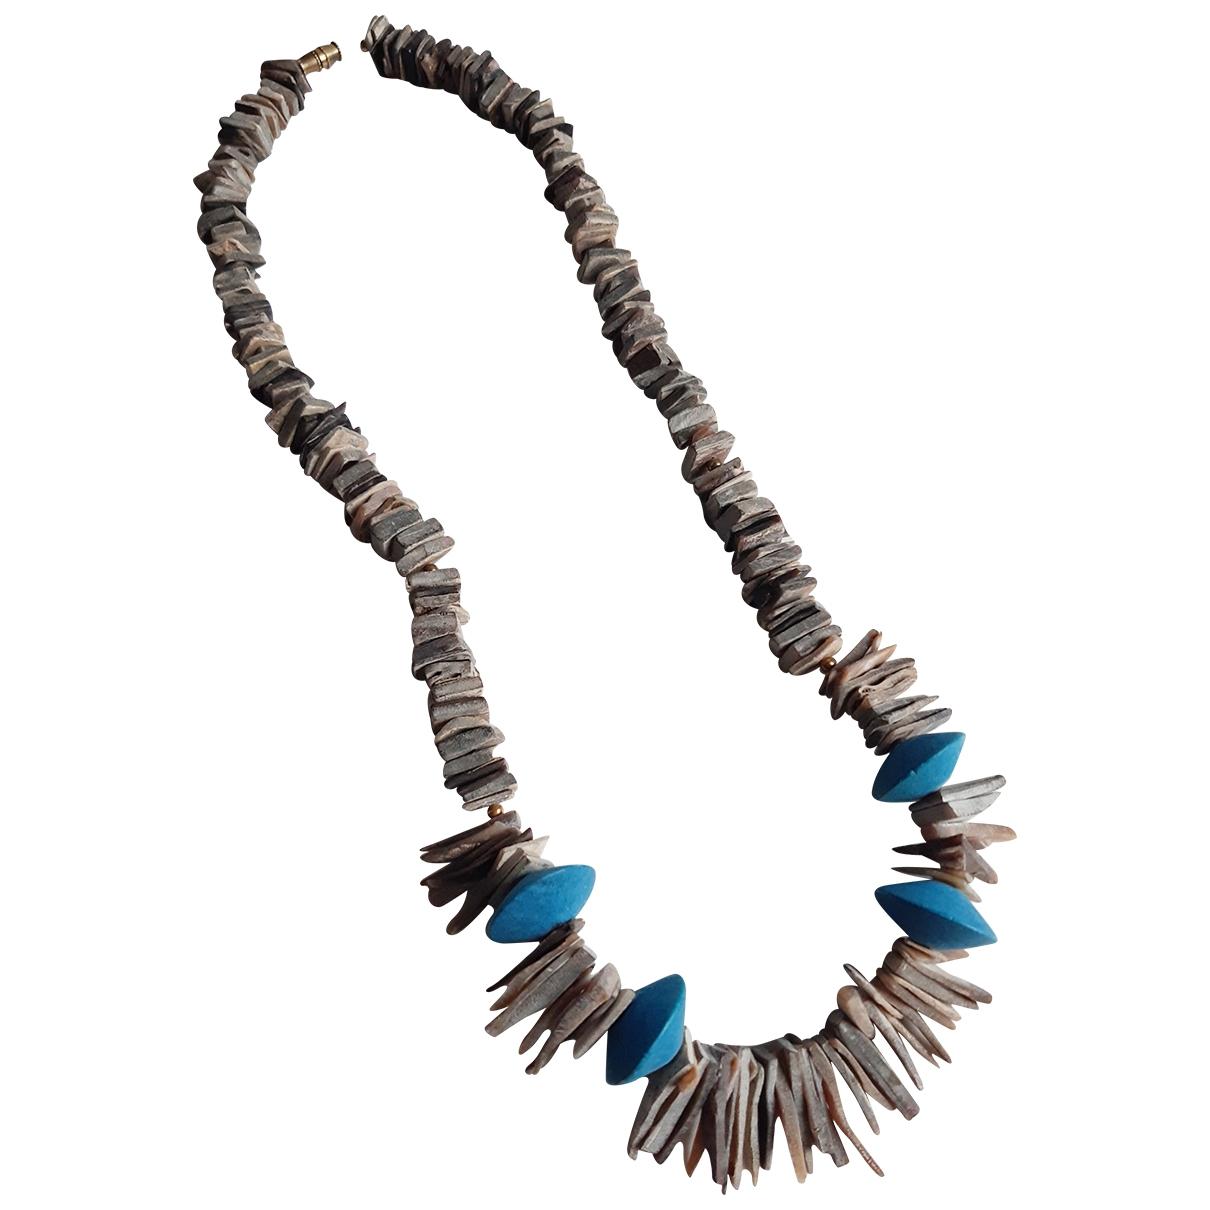 Collar Motifs Ethniques de Perlas Non Signe / Unsigned